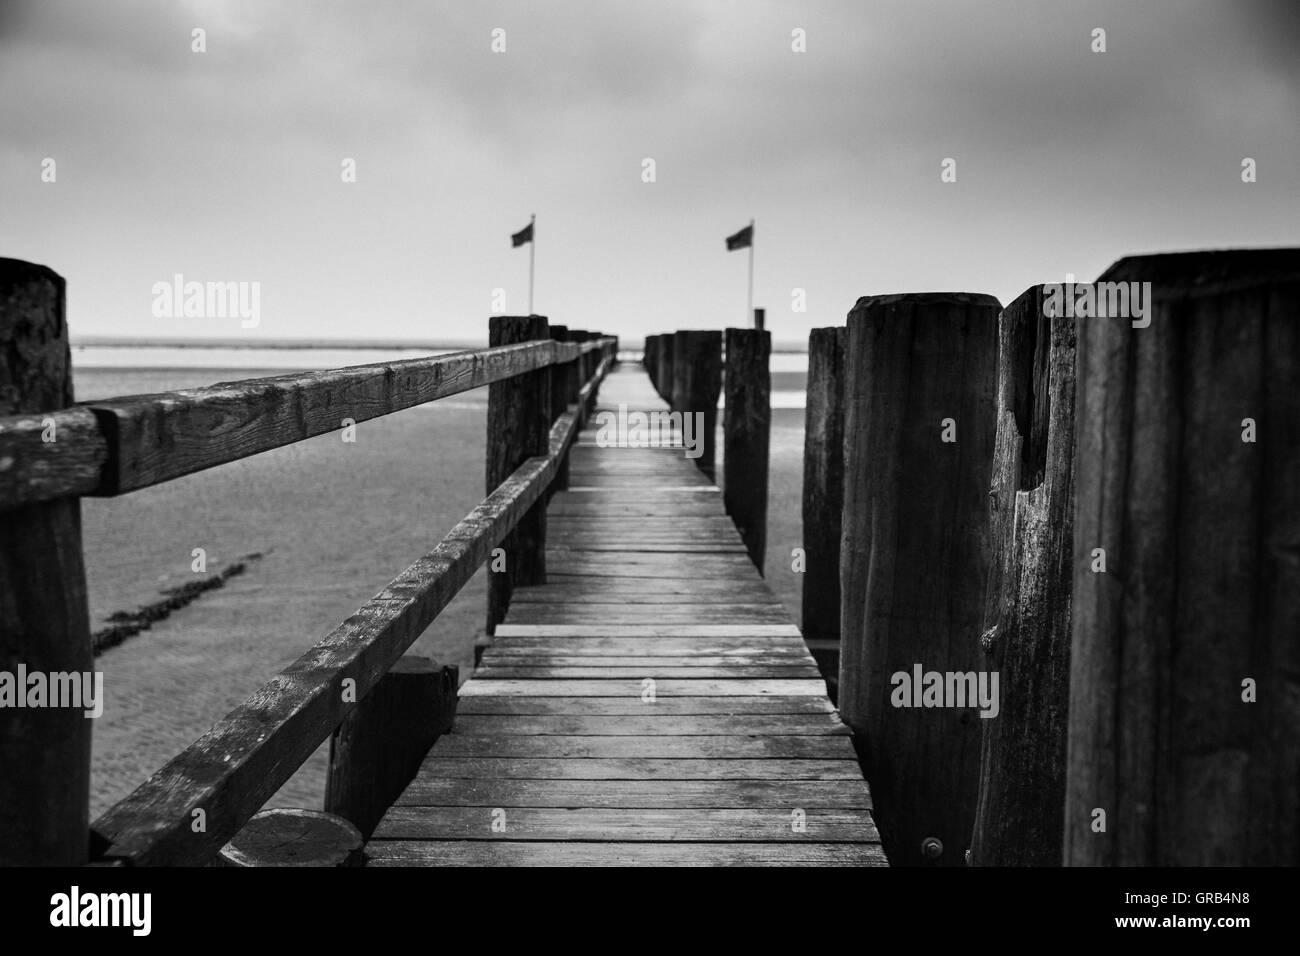 Dock Bw - Stock Image